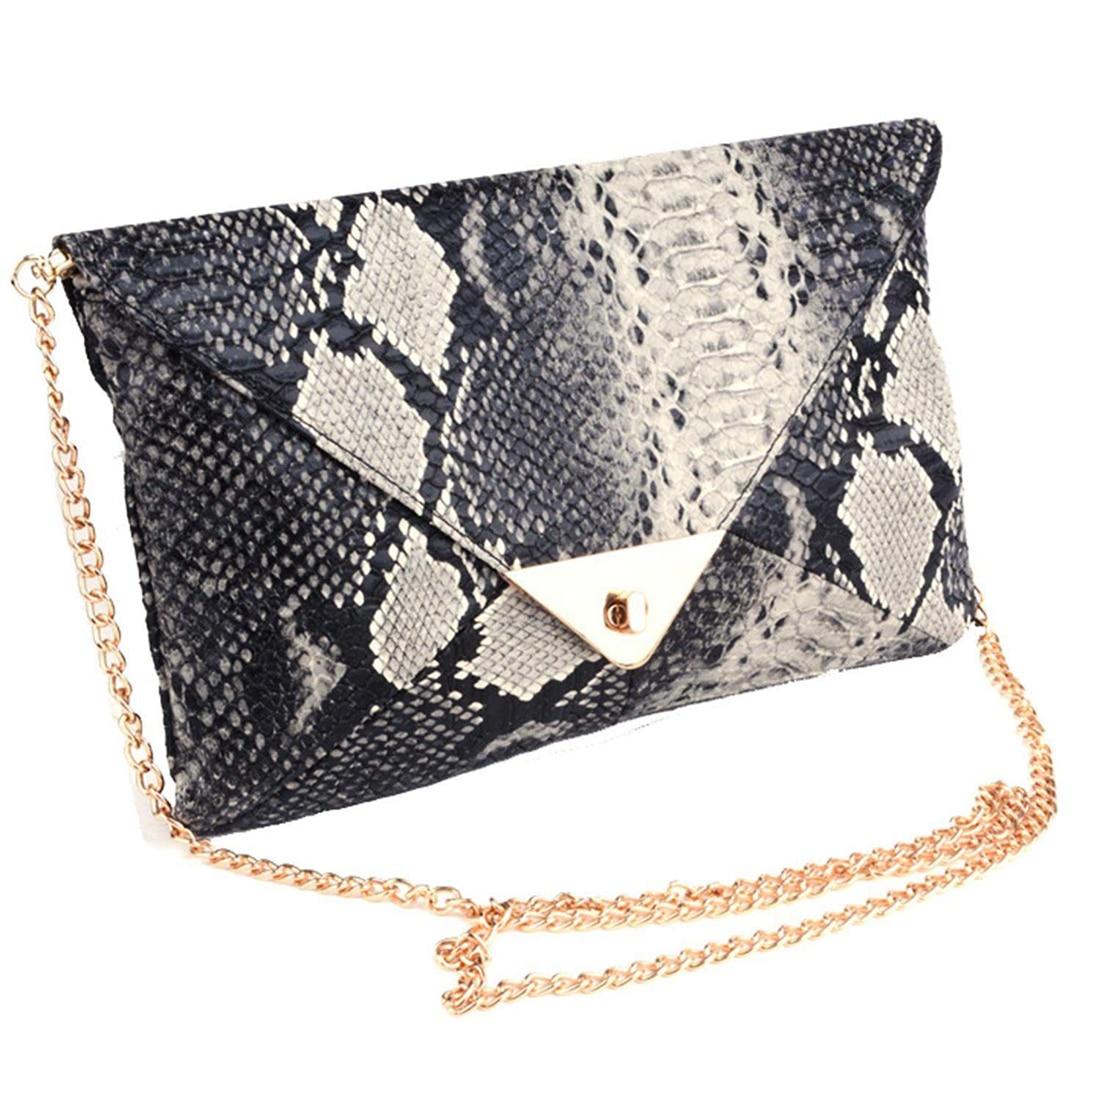 Women's Snake skin Print Accent Envelope Statement Clutch Bag per se two tone snake skin pants